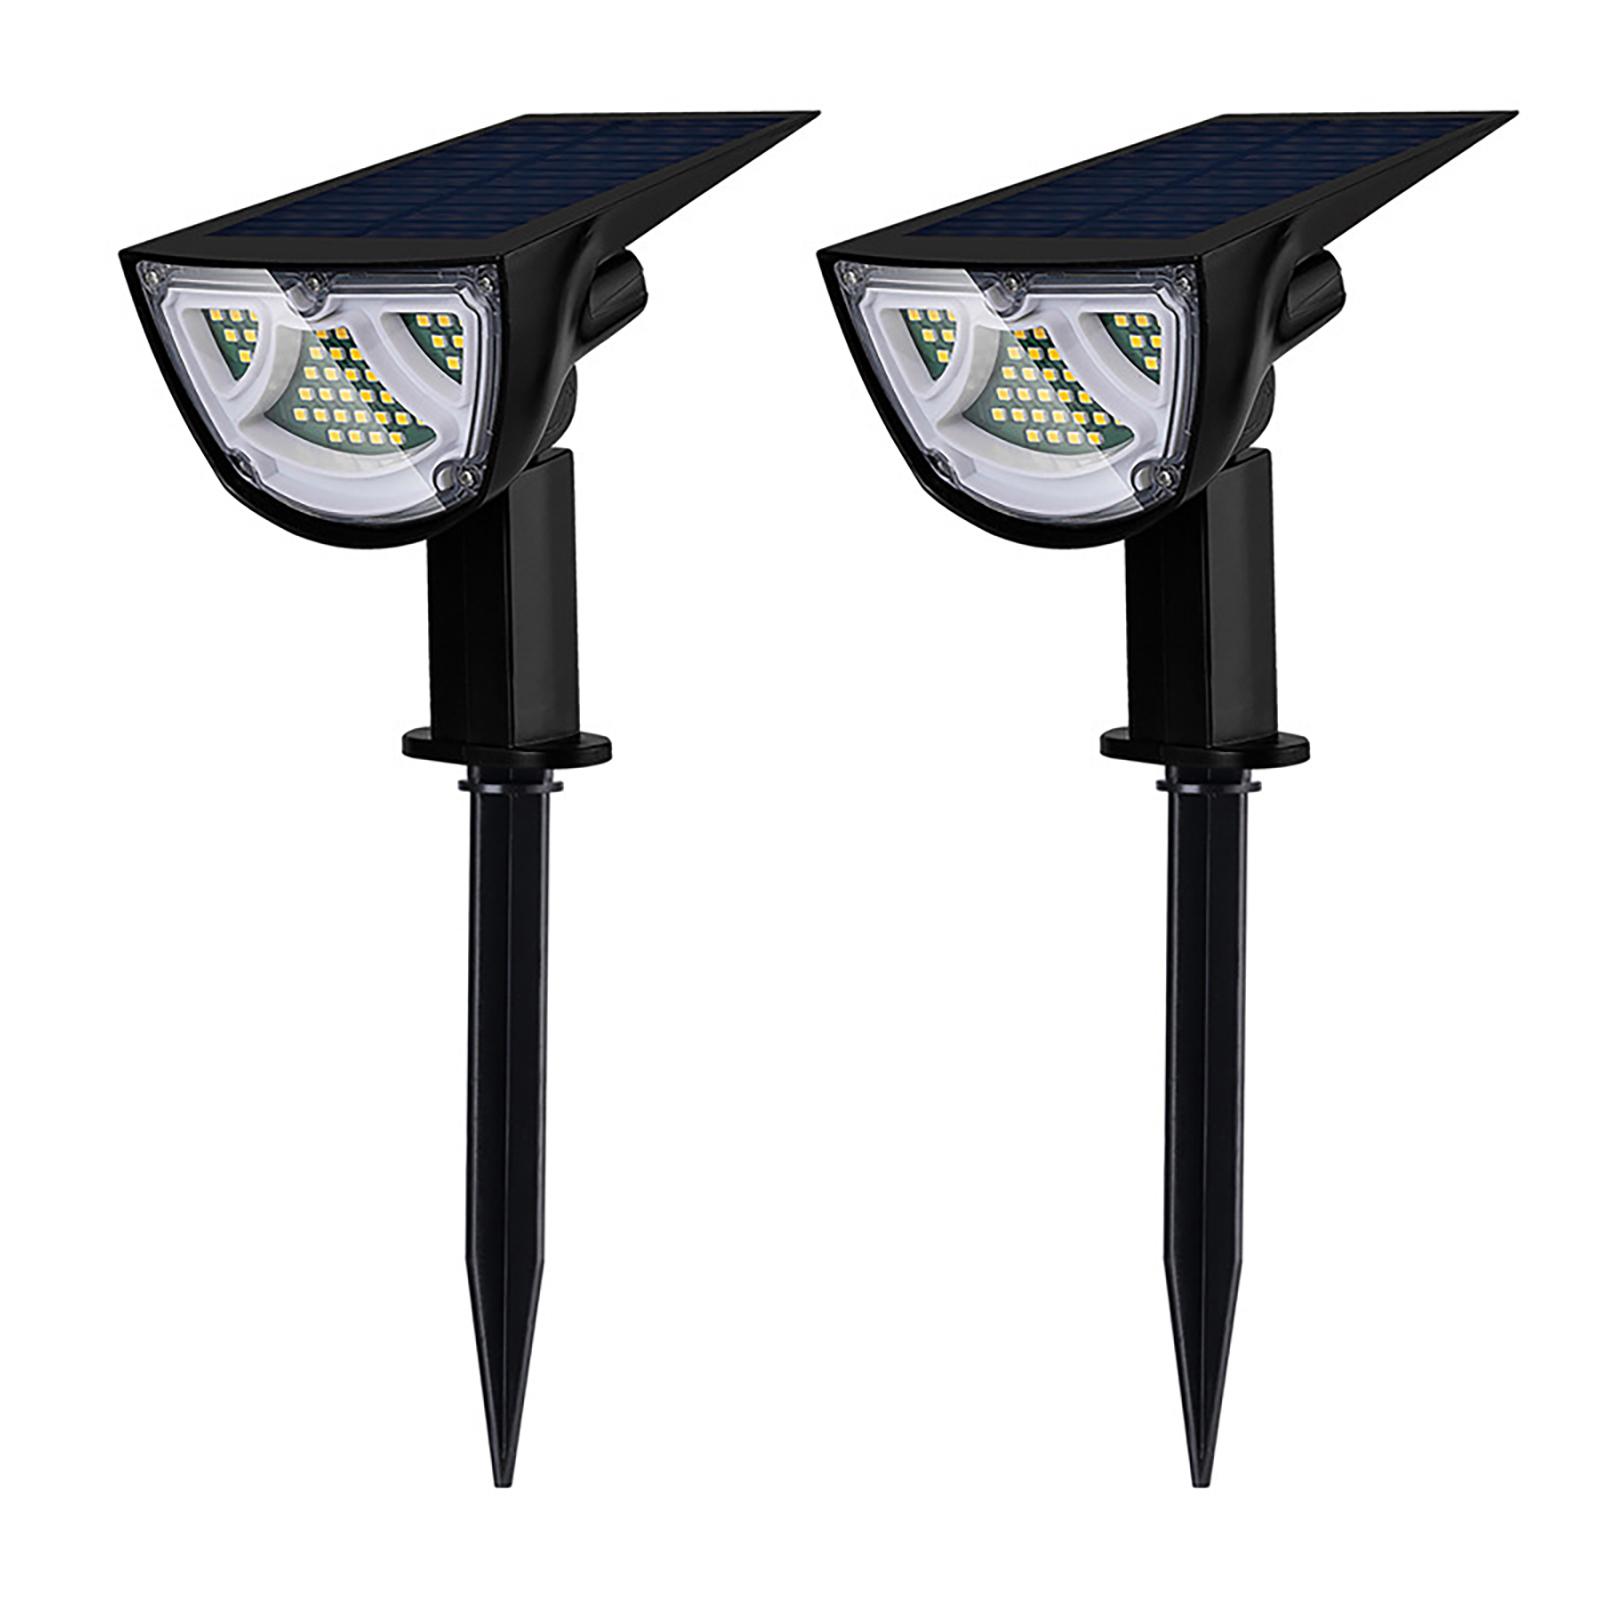 2 Packs LED Solar Spot, Waterproof-Landscape Ligjht, 501 Original, Cesdeals  - buy with discount